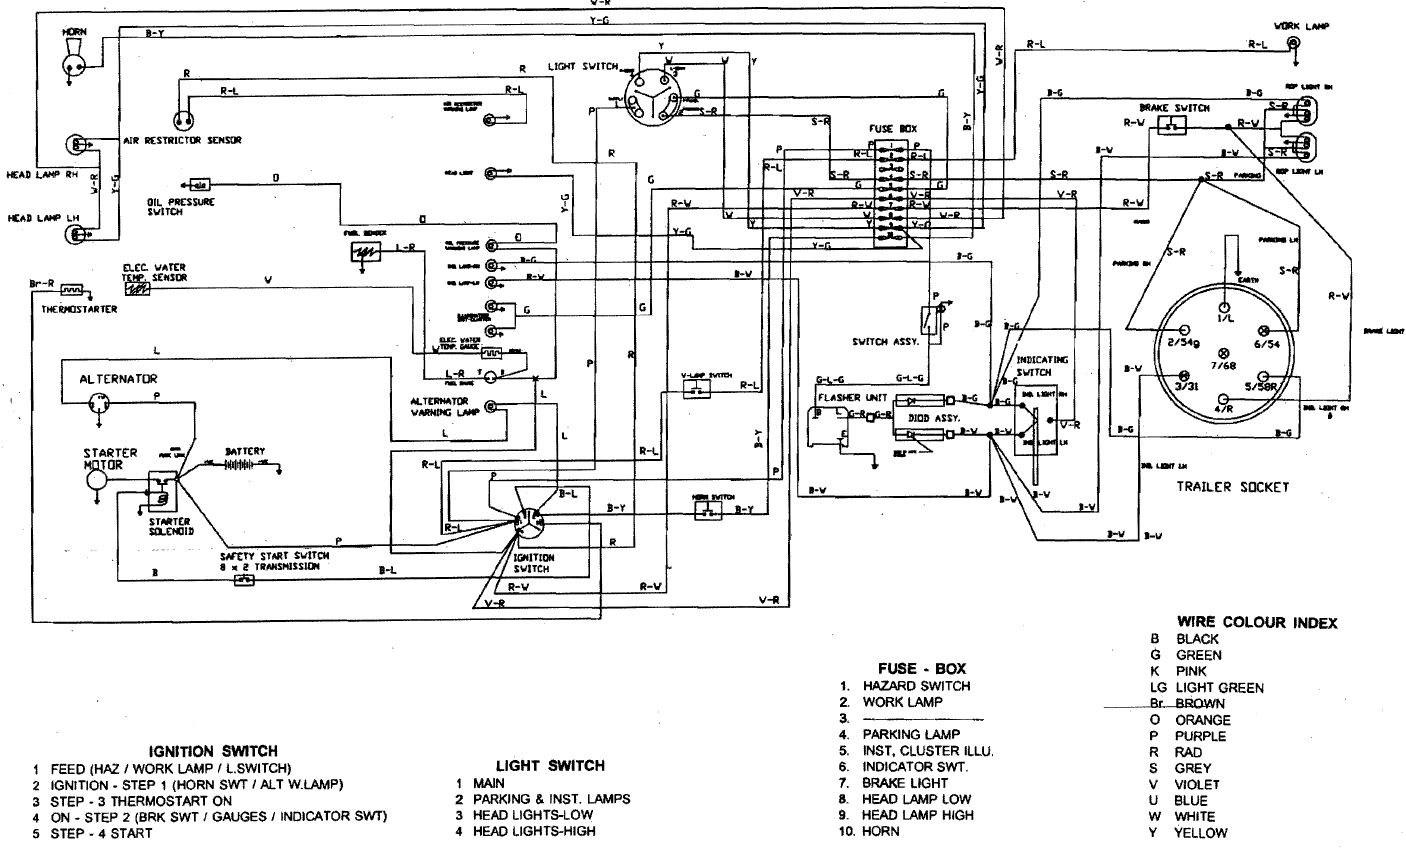 RS_3240] Generac Generator Transfer Switch Diagram Free Diagram   Generac 11kw Generator Wiring Schematic      Timew Arch Denli Mohammedshrine Librar Wiring 101